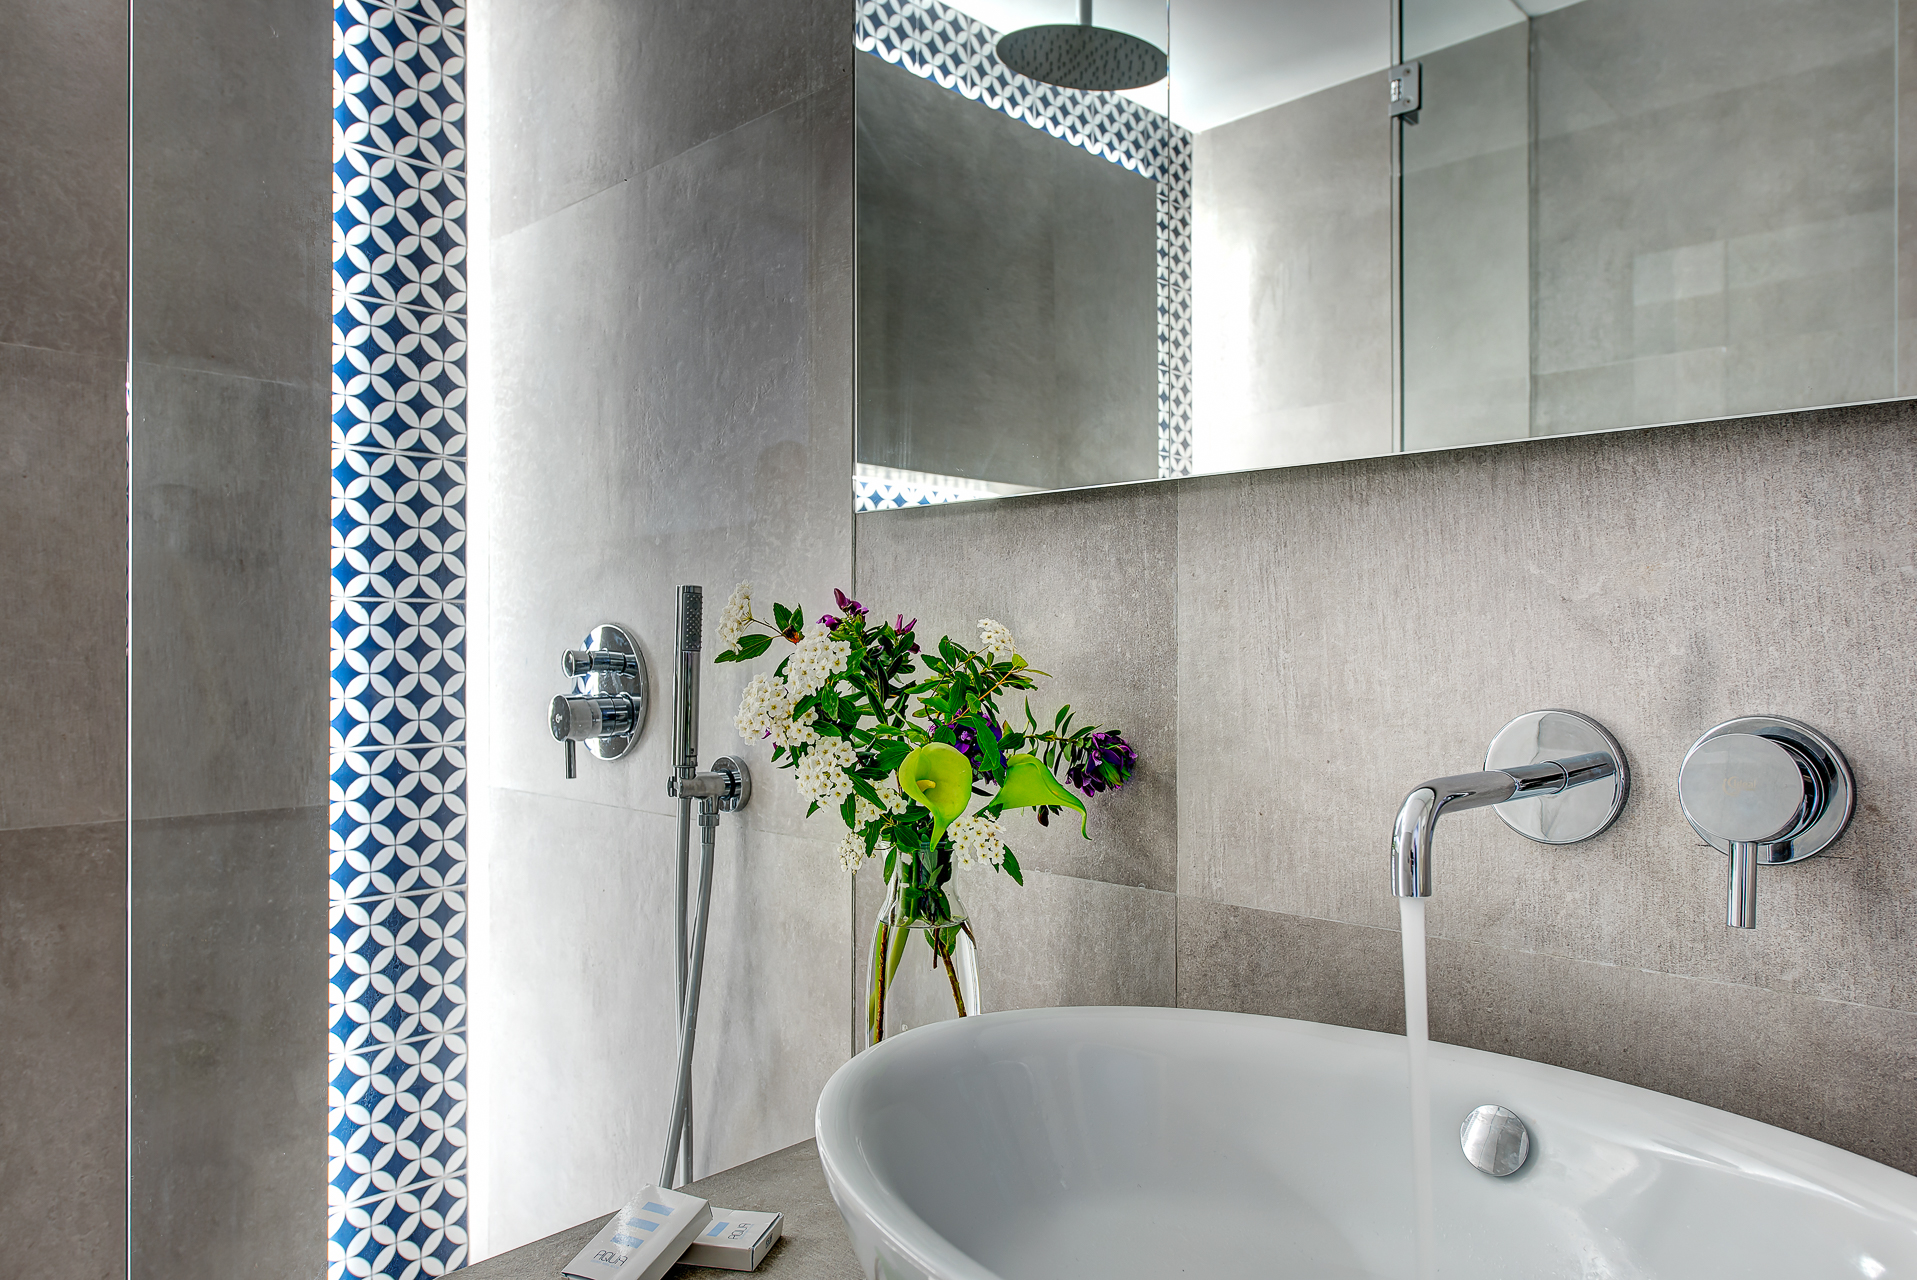 gocce di capri three bedroom apatment classic massa lubrense bathroom